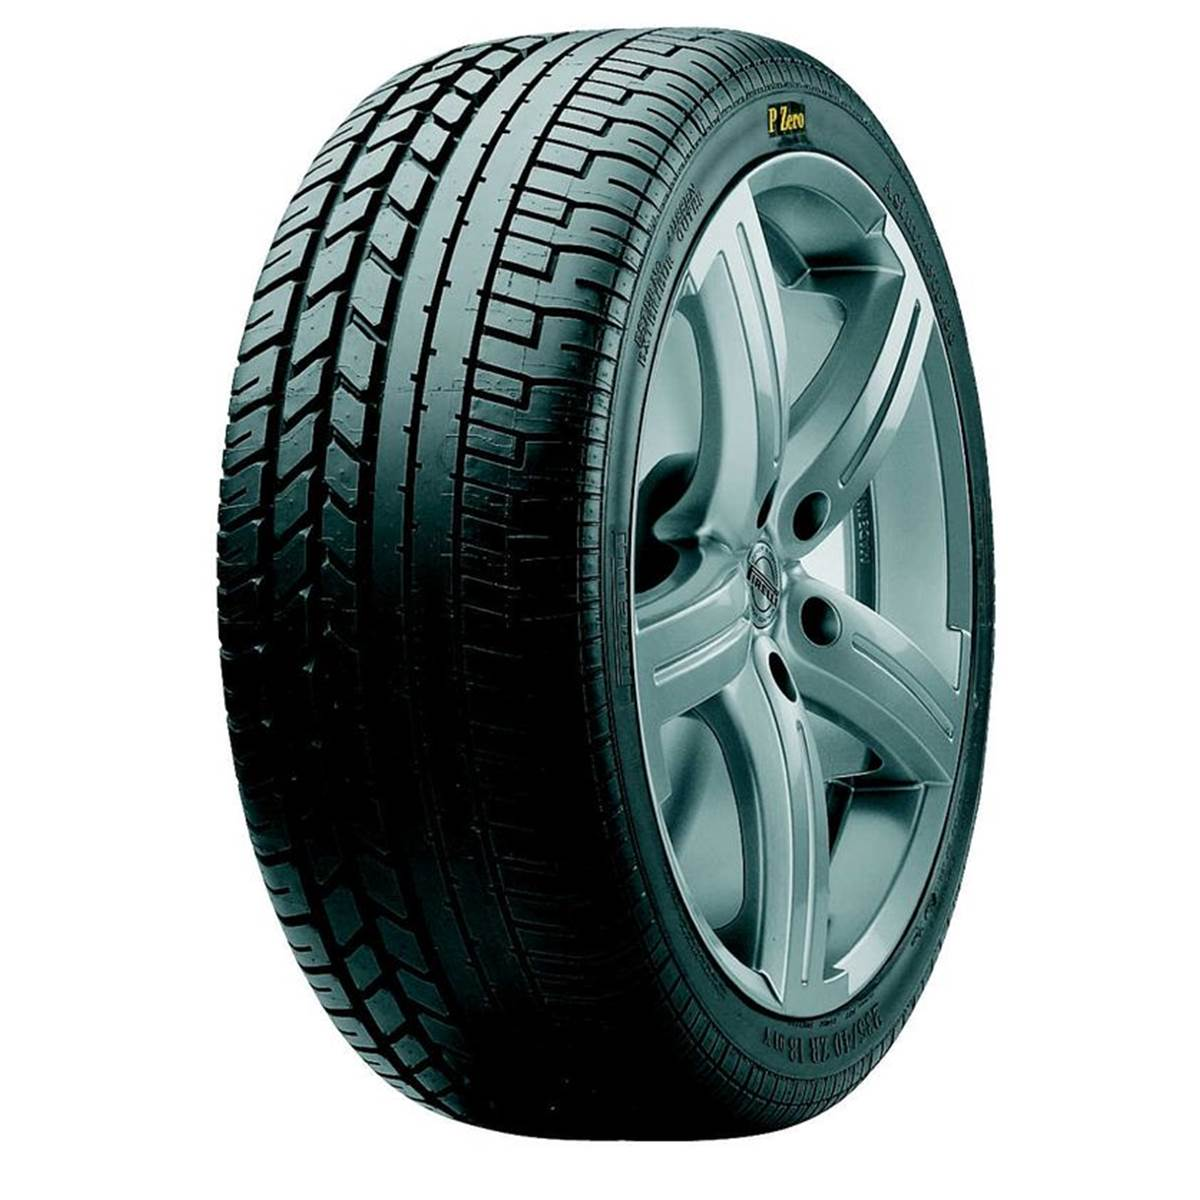 Pneu Pirelli 235/40R17 90Y Pzero Asimmetrico